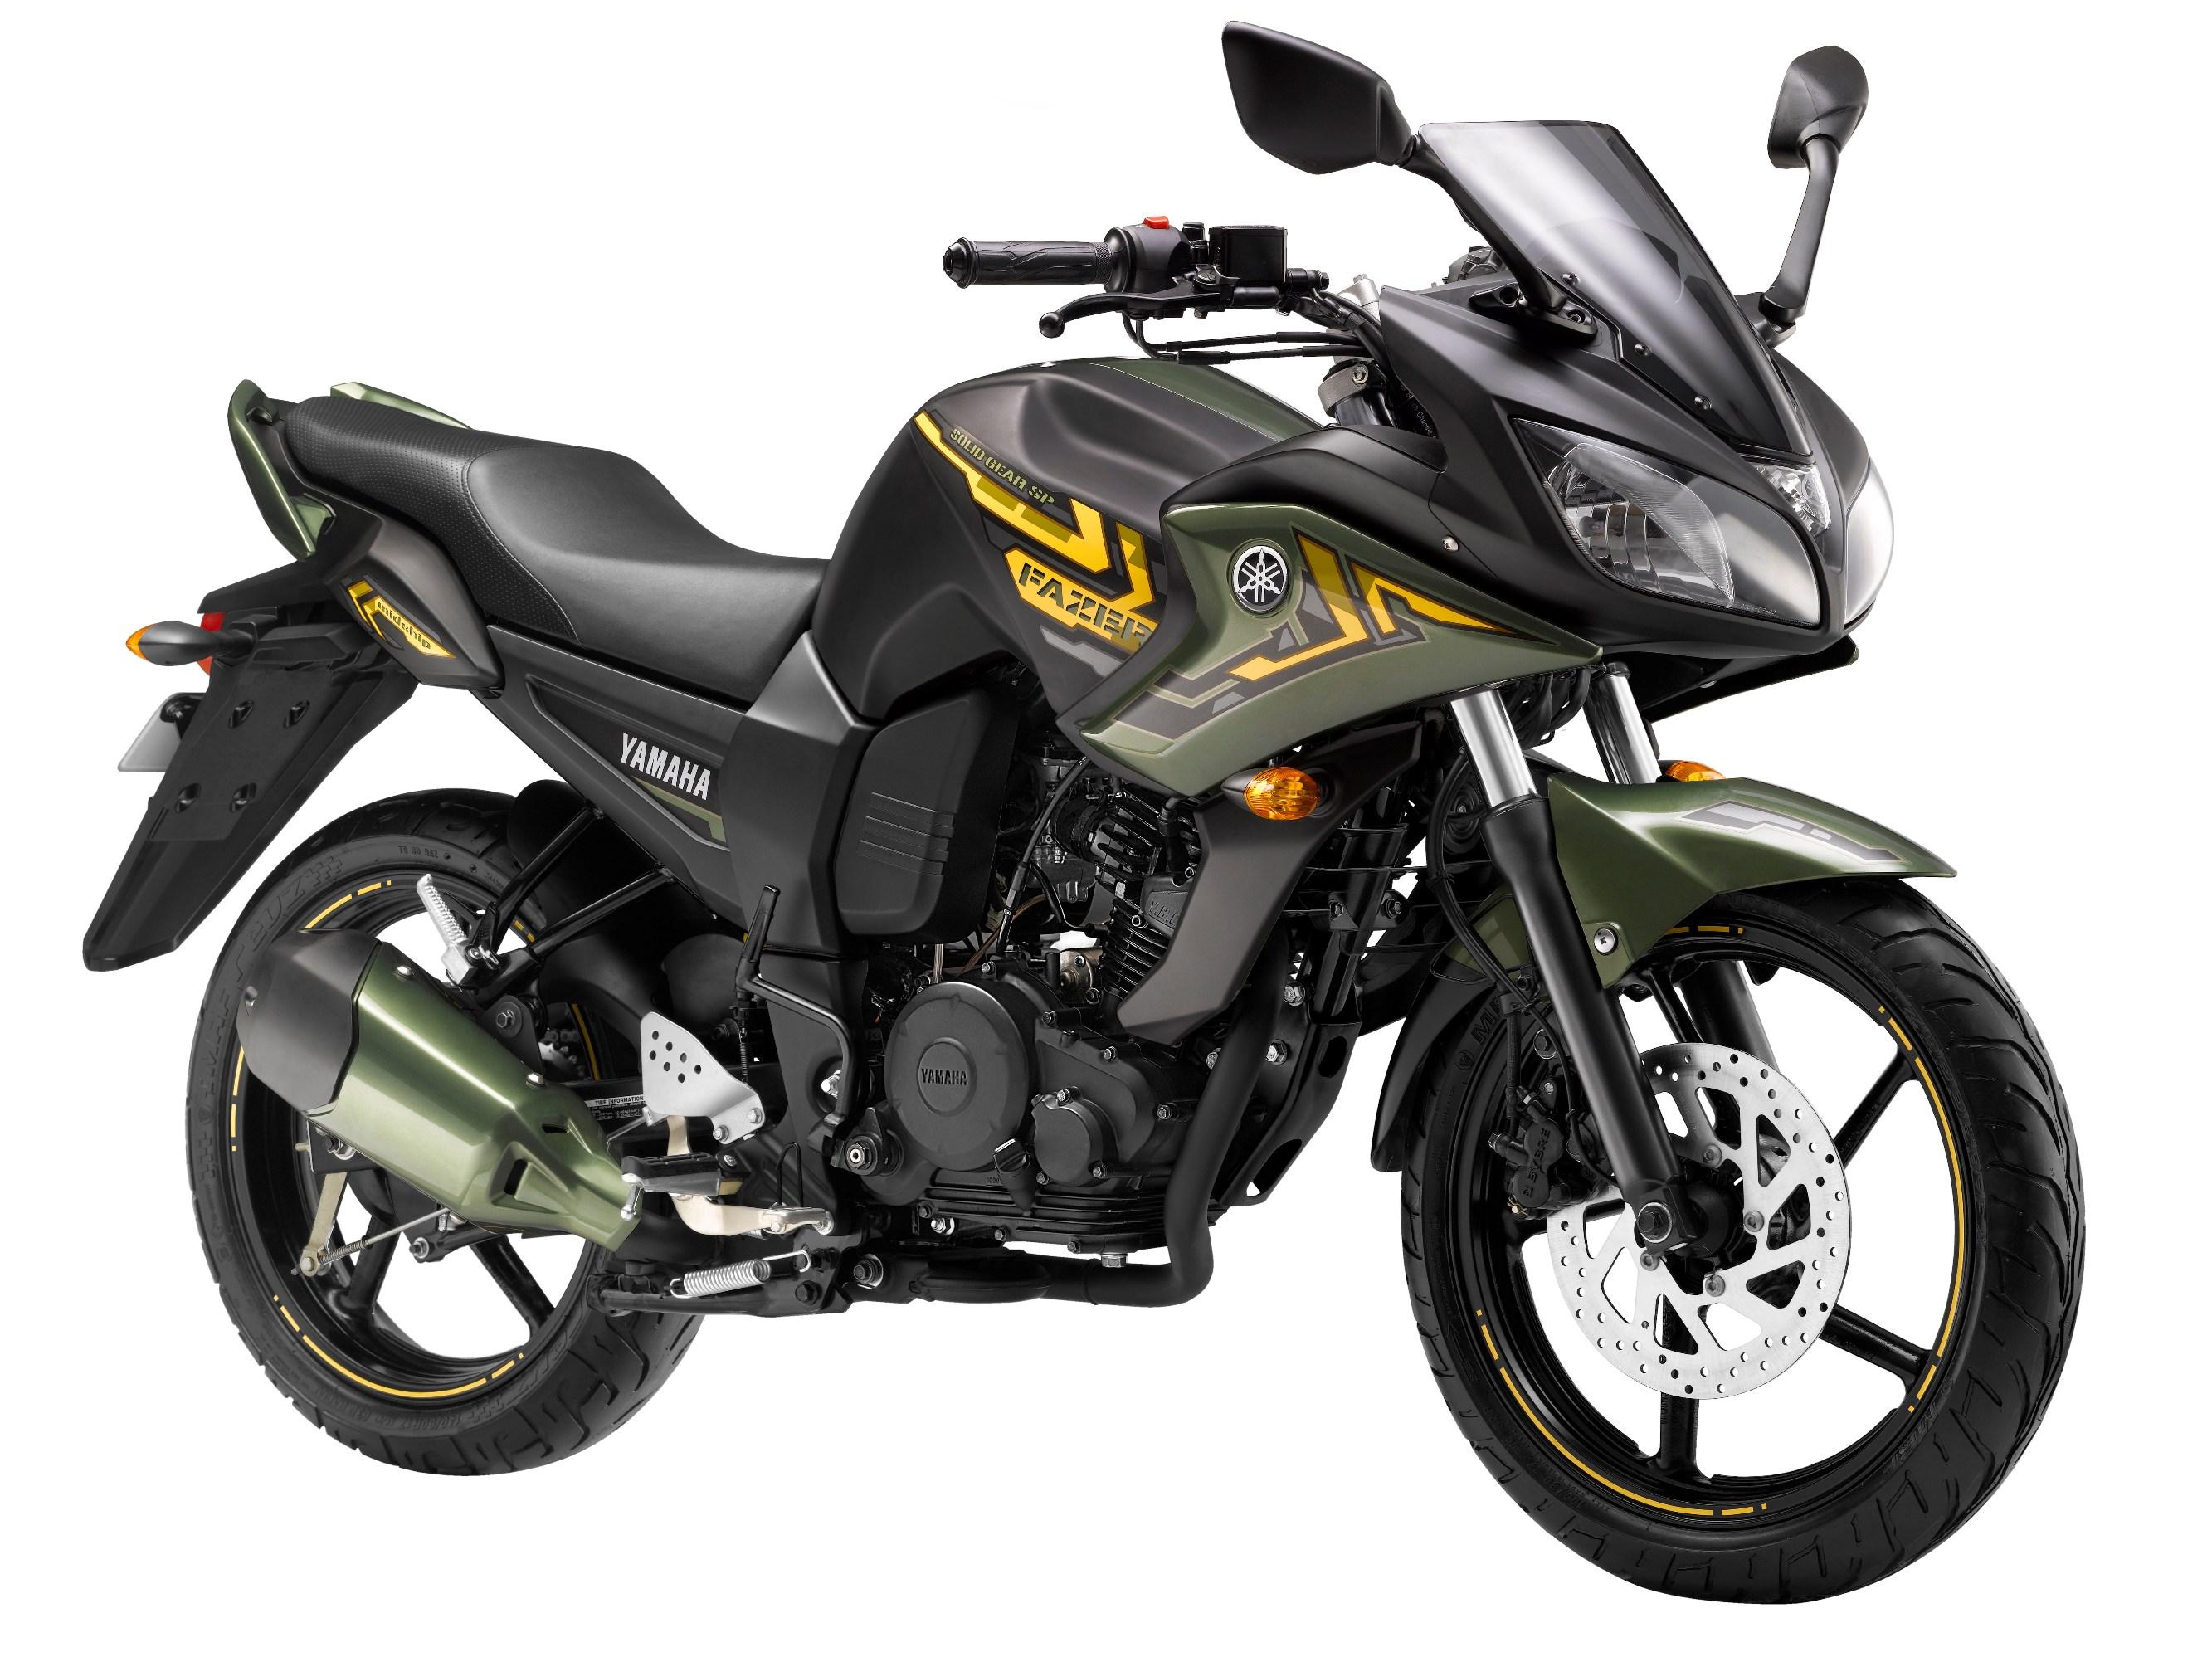 Yamaha Special Edition Fz S And Fazer Photo Gallery